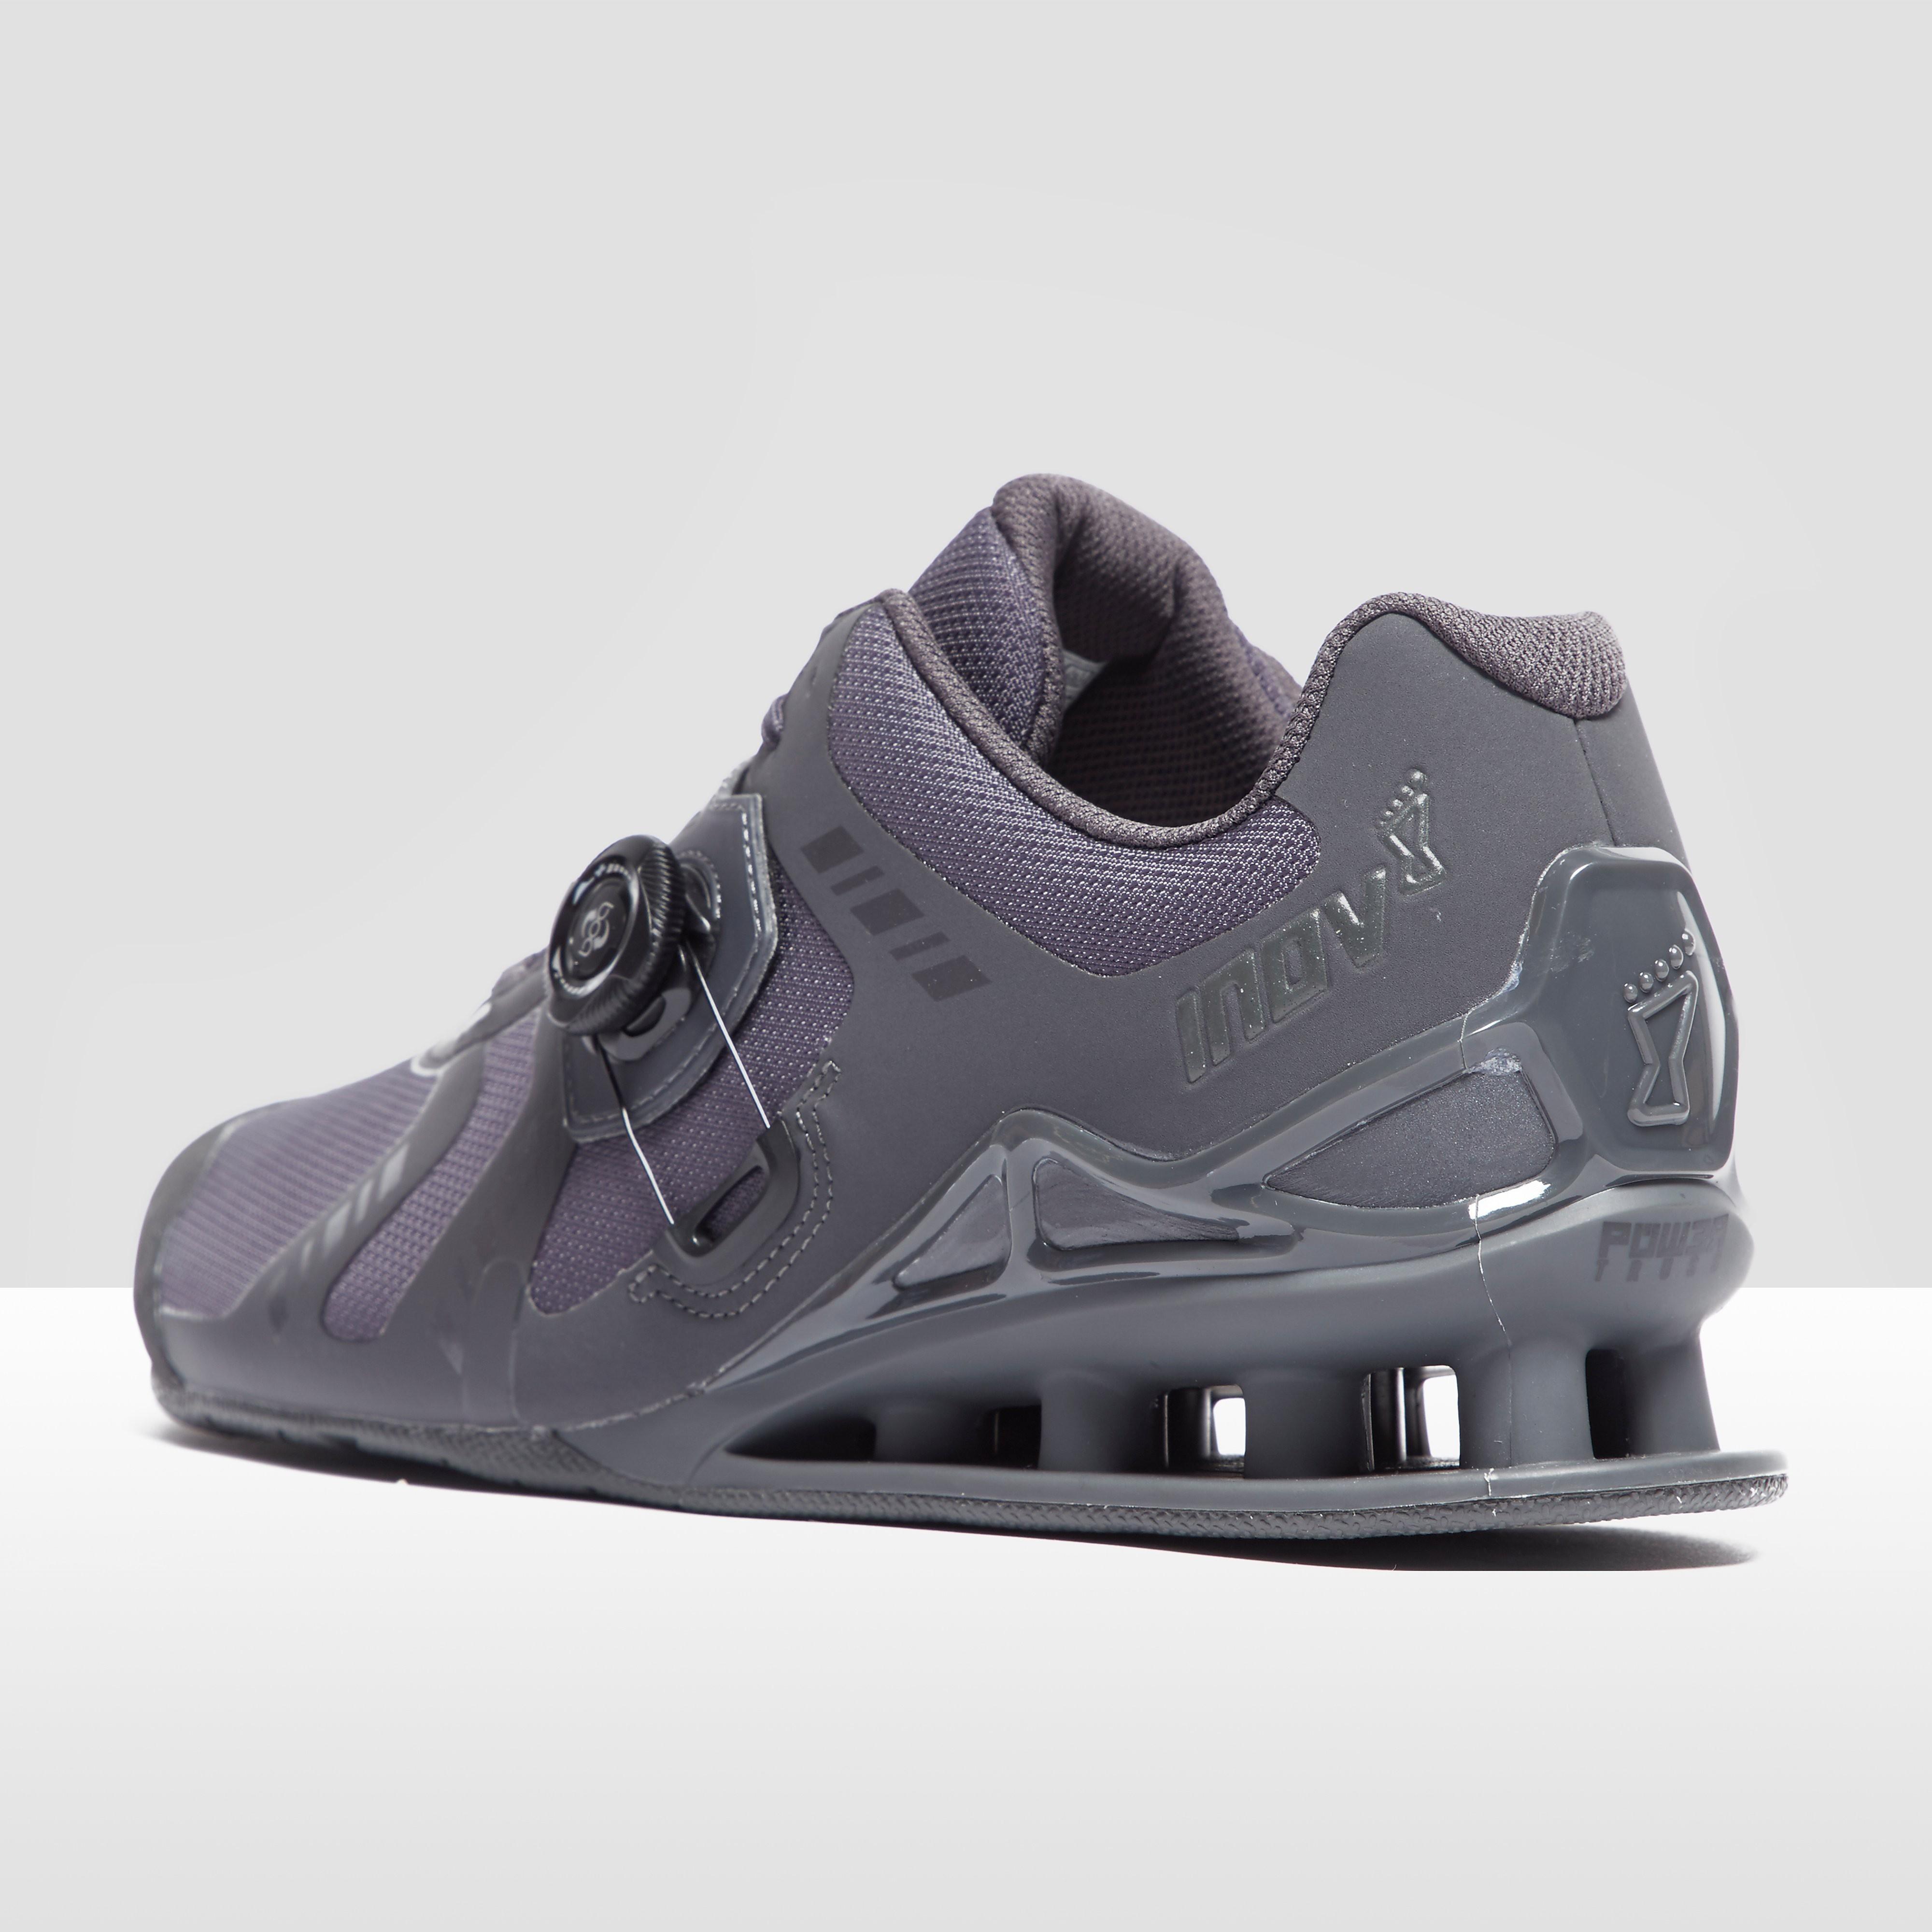 Inov-8 Fastlift 400 BOA Men's Training Shoes